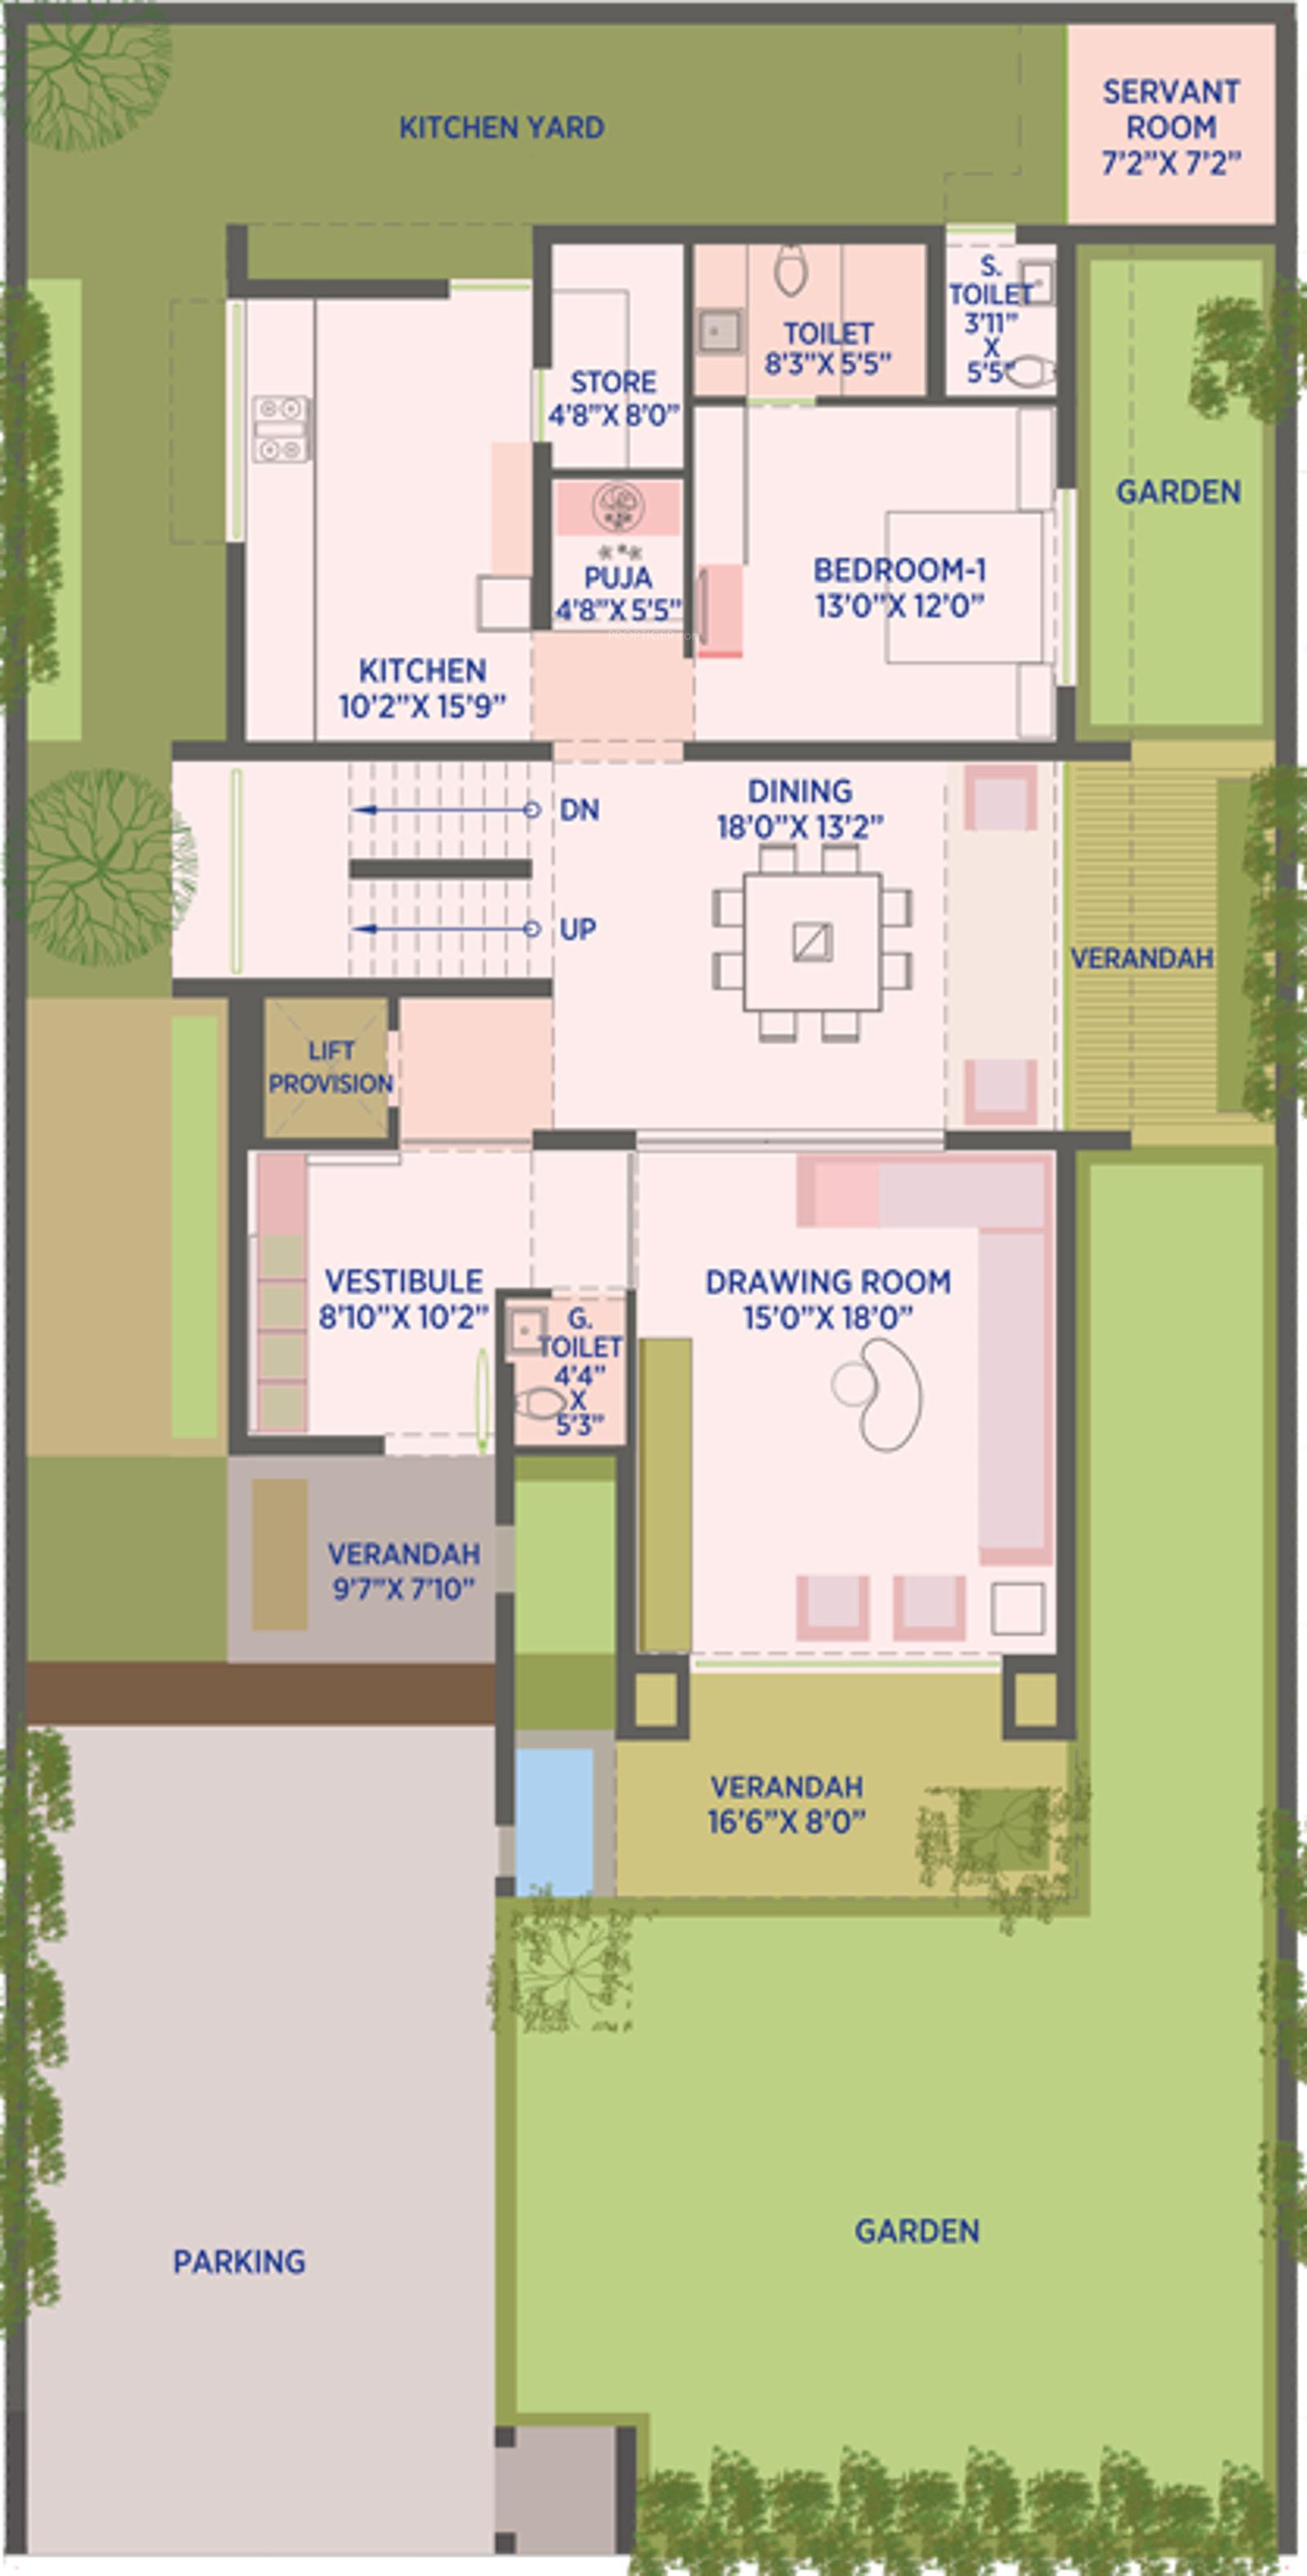 goyal vernis in shela ahmedabad price location map floor plan reviews. Black Bedroom Furniture Sets. Home Design Ideas